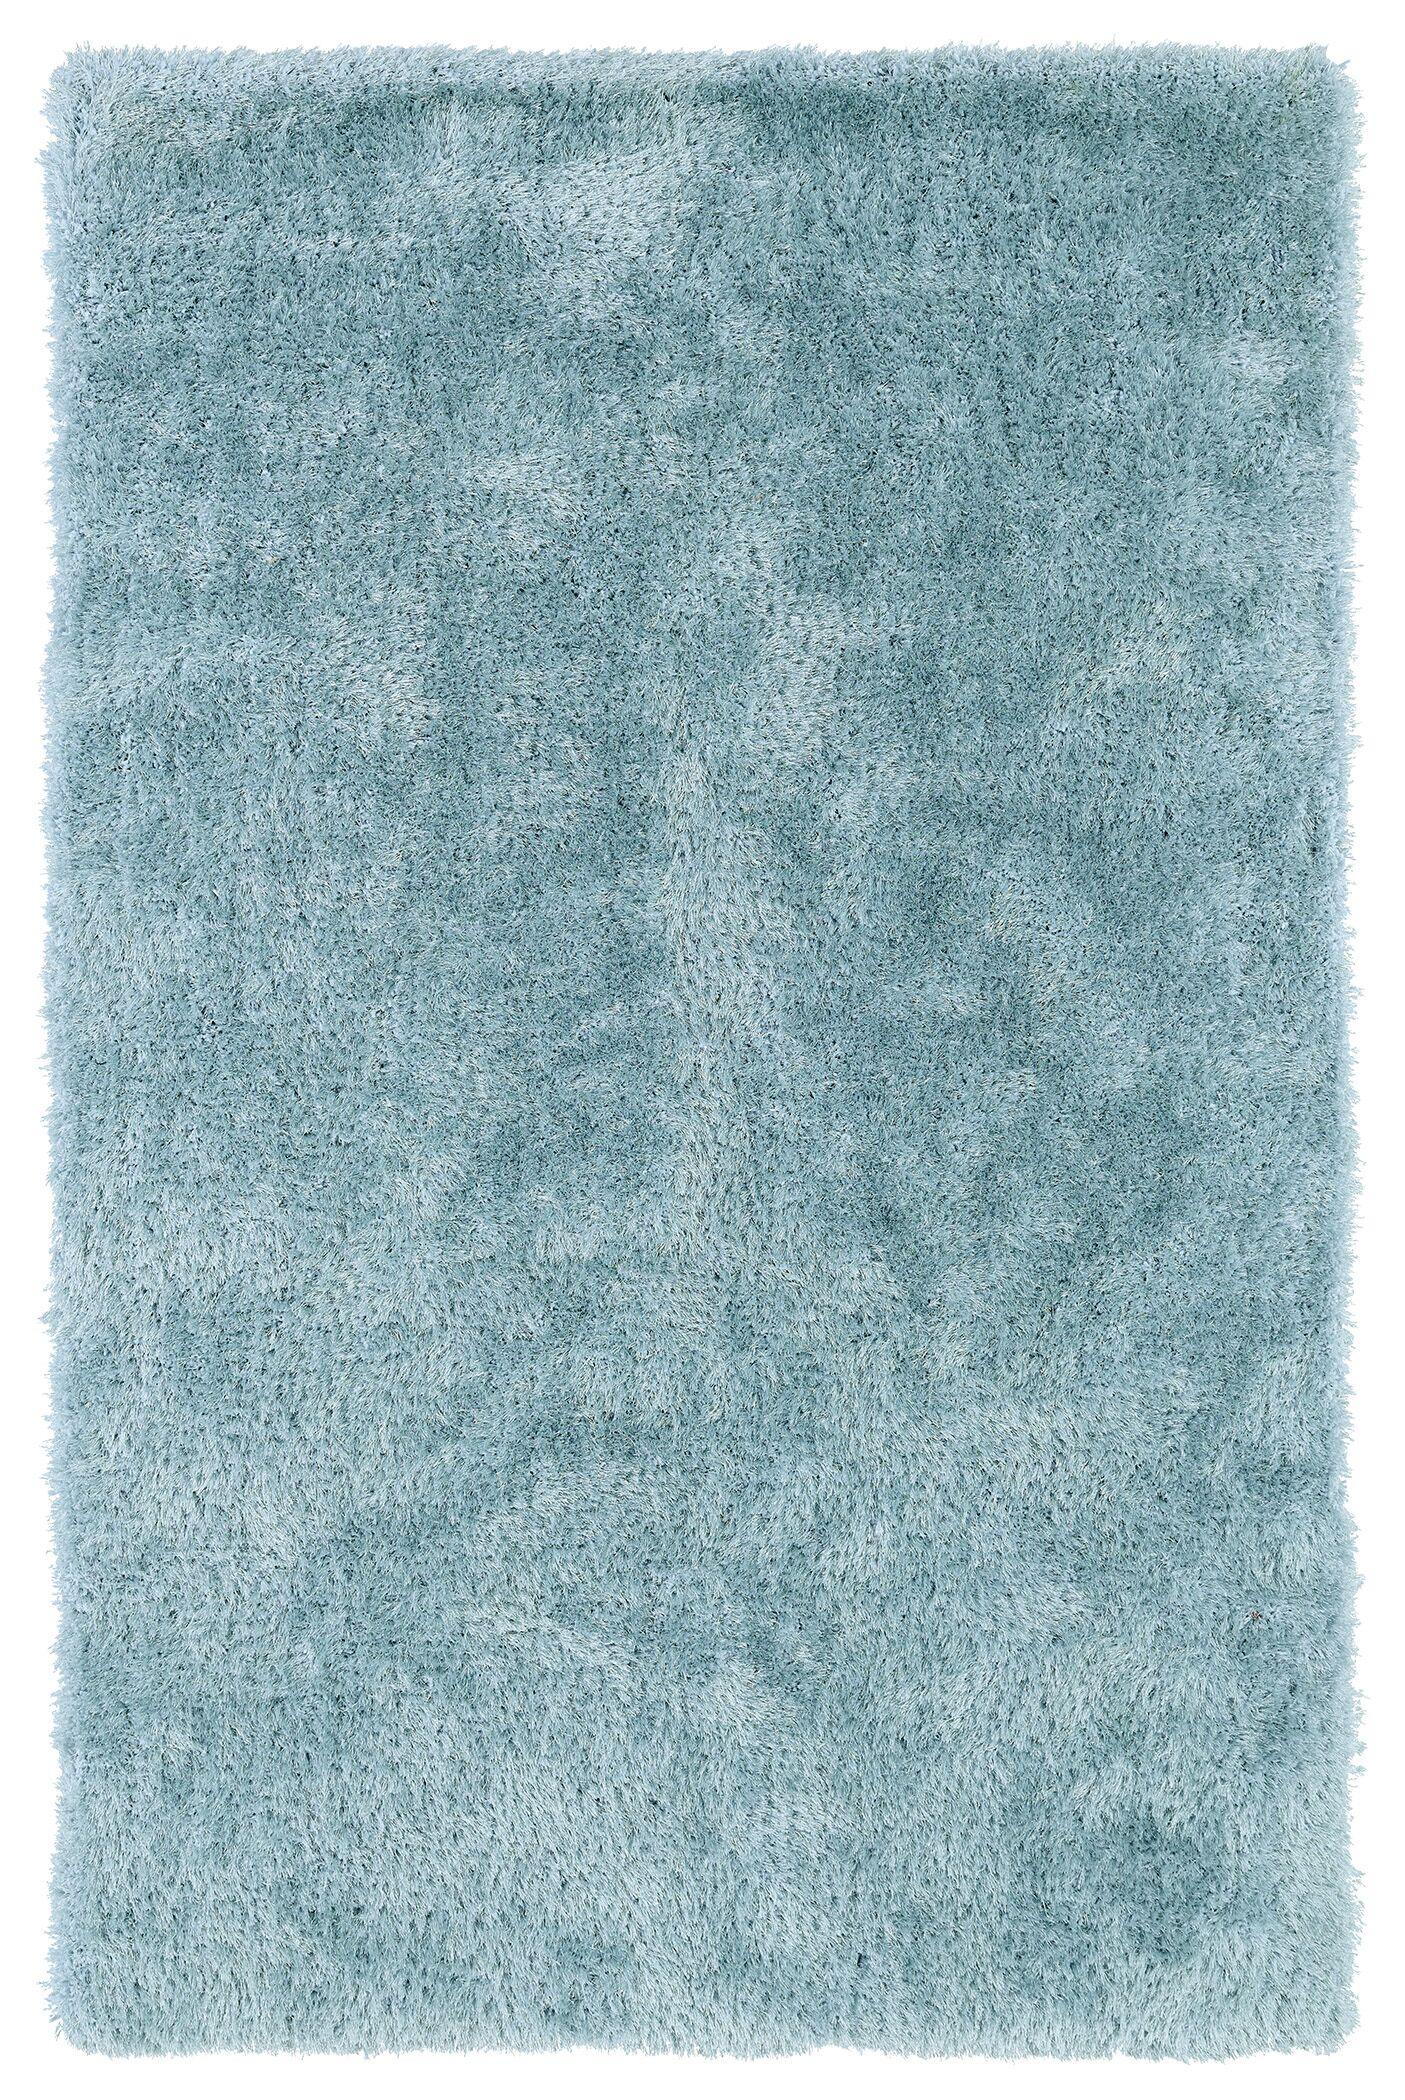 Selman Light Blue Area Rug Rug Size: Rectangle 5' x 7'